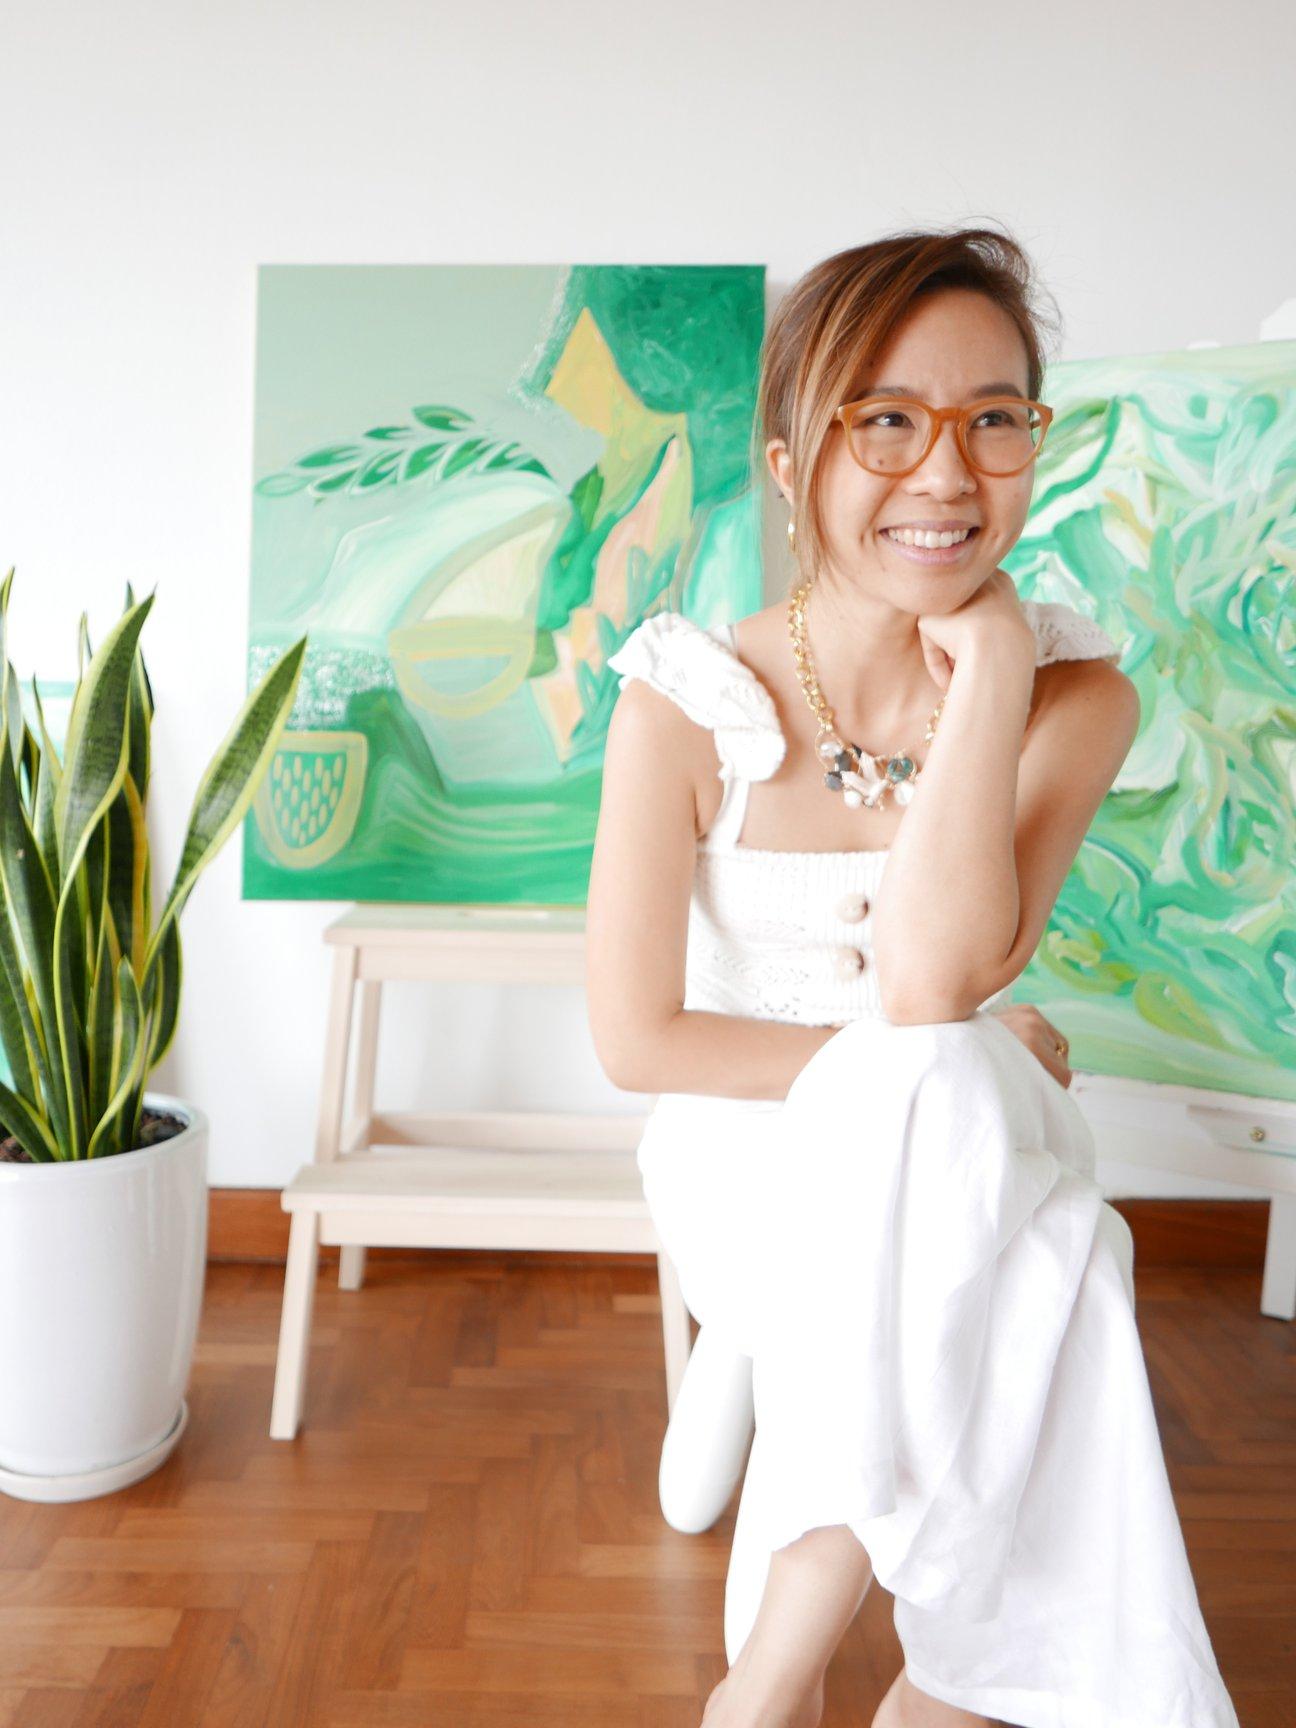 LOOQ behind the brand: Hadassah Lau, Founder, Hadasity